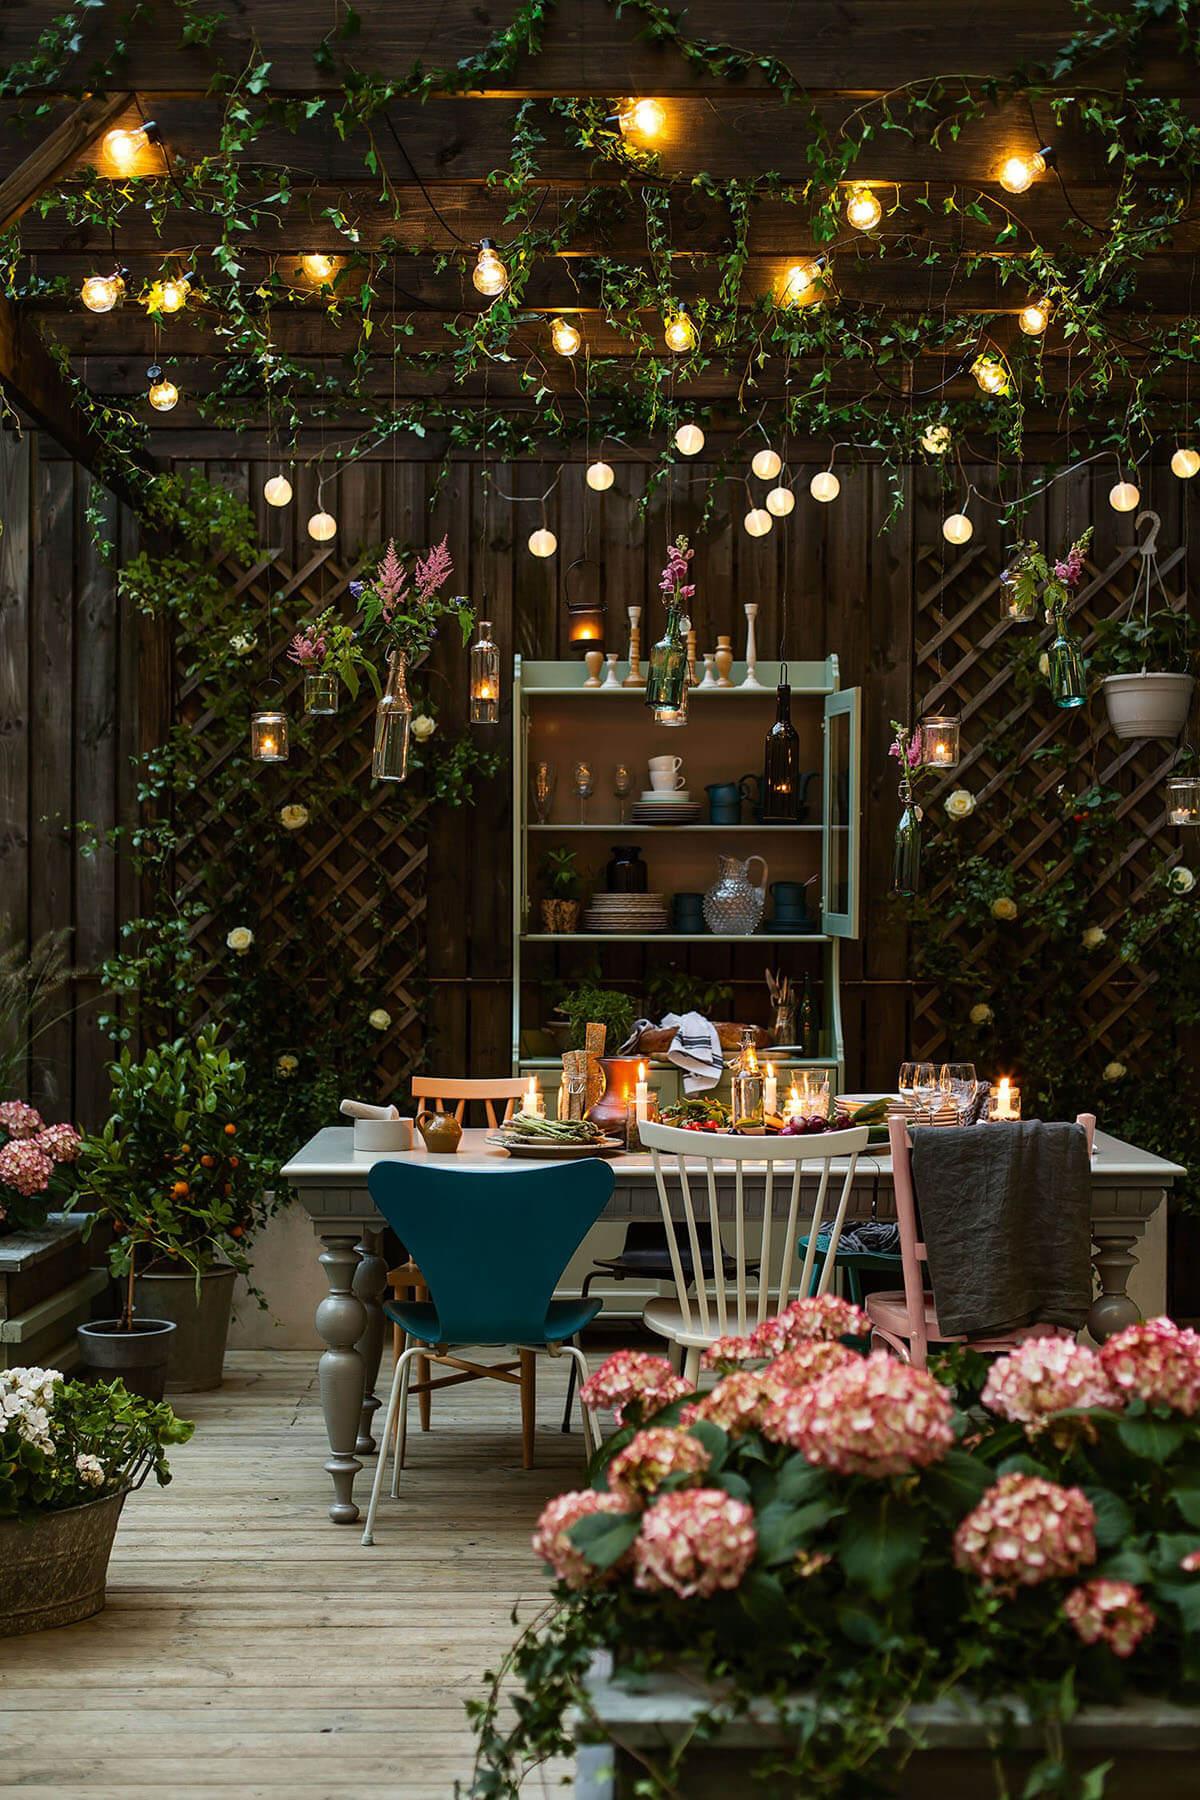 27 Best Backyard Lighting Ideas and Designs for 2020 on Backyard String Light Designs id=90330